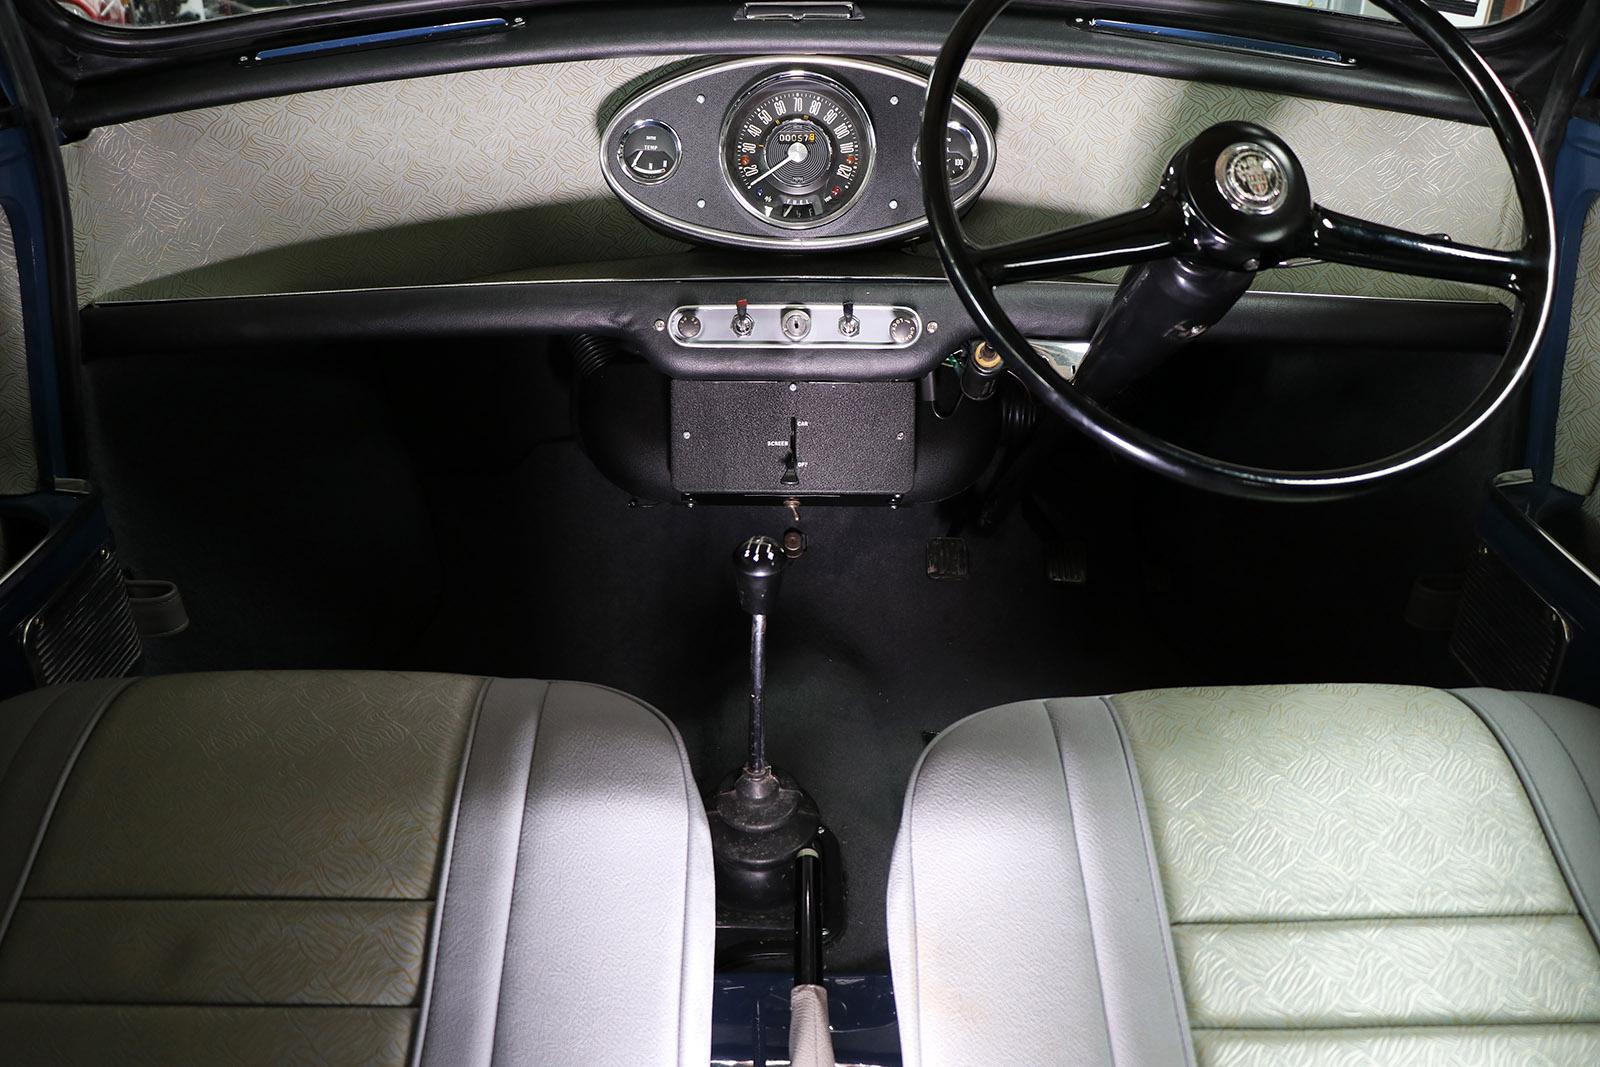 1967 blue 1275 Mini Cooper S Sayer Selection Wilkinson 25 web.jpg